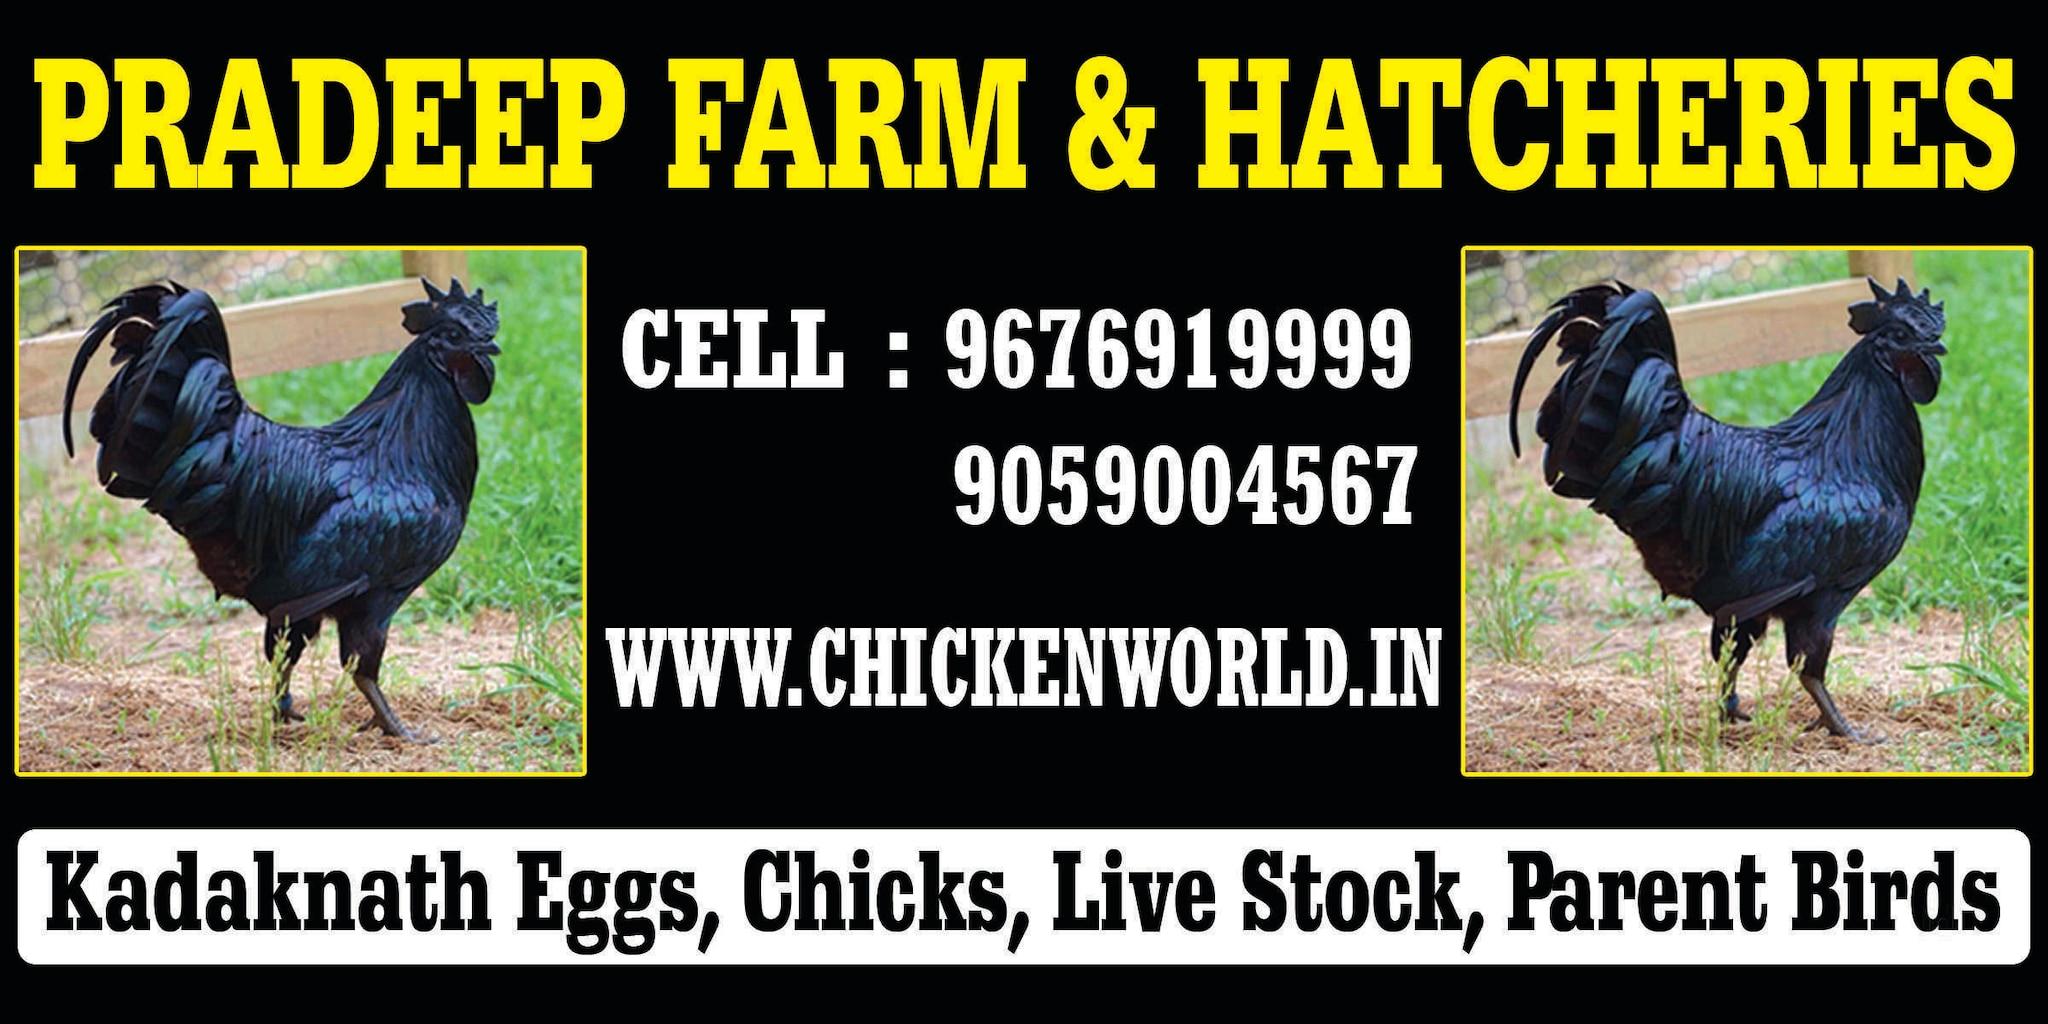 Top Kadaknath Chicken Suppliers in Vijayawada - Best Kadaknath